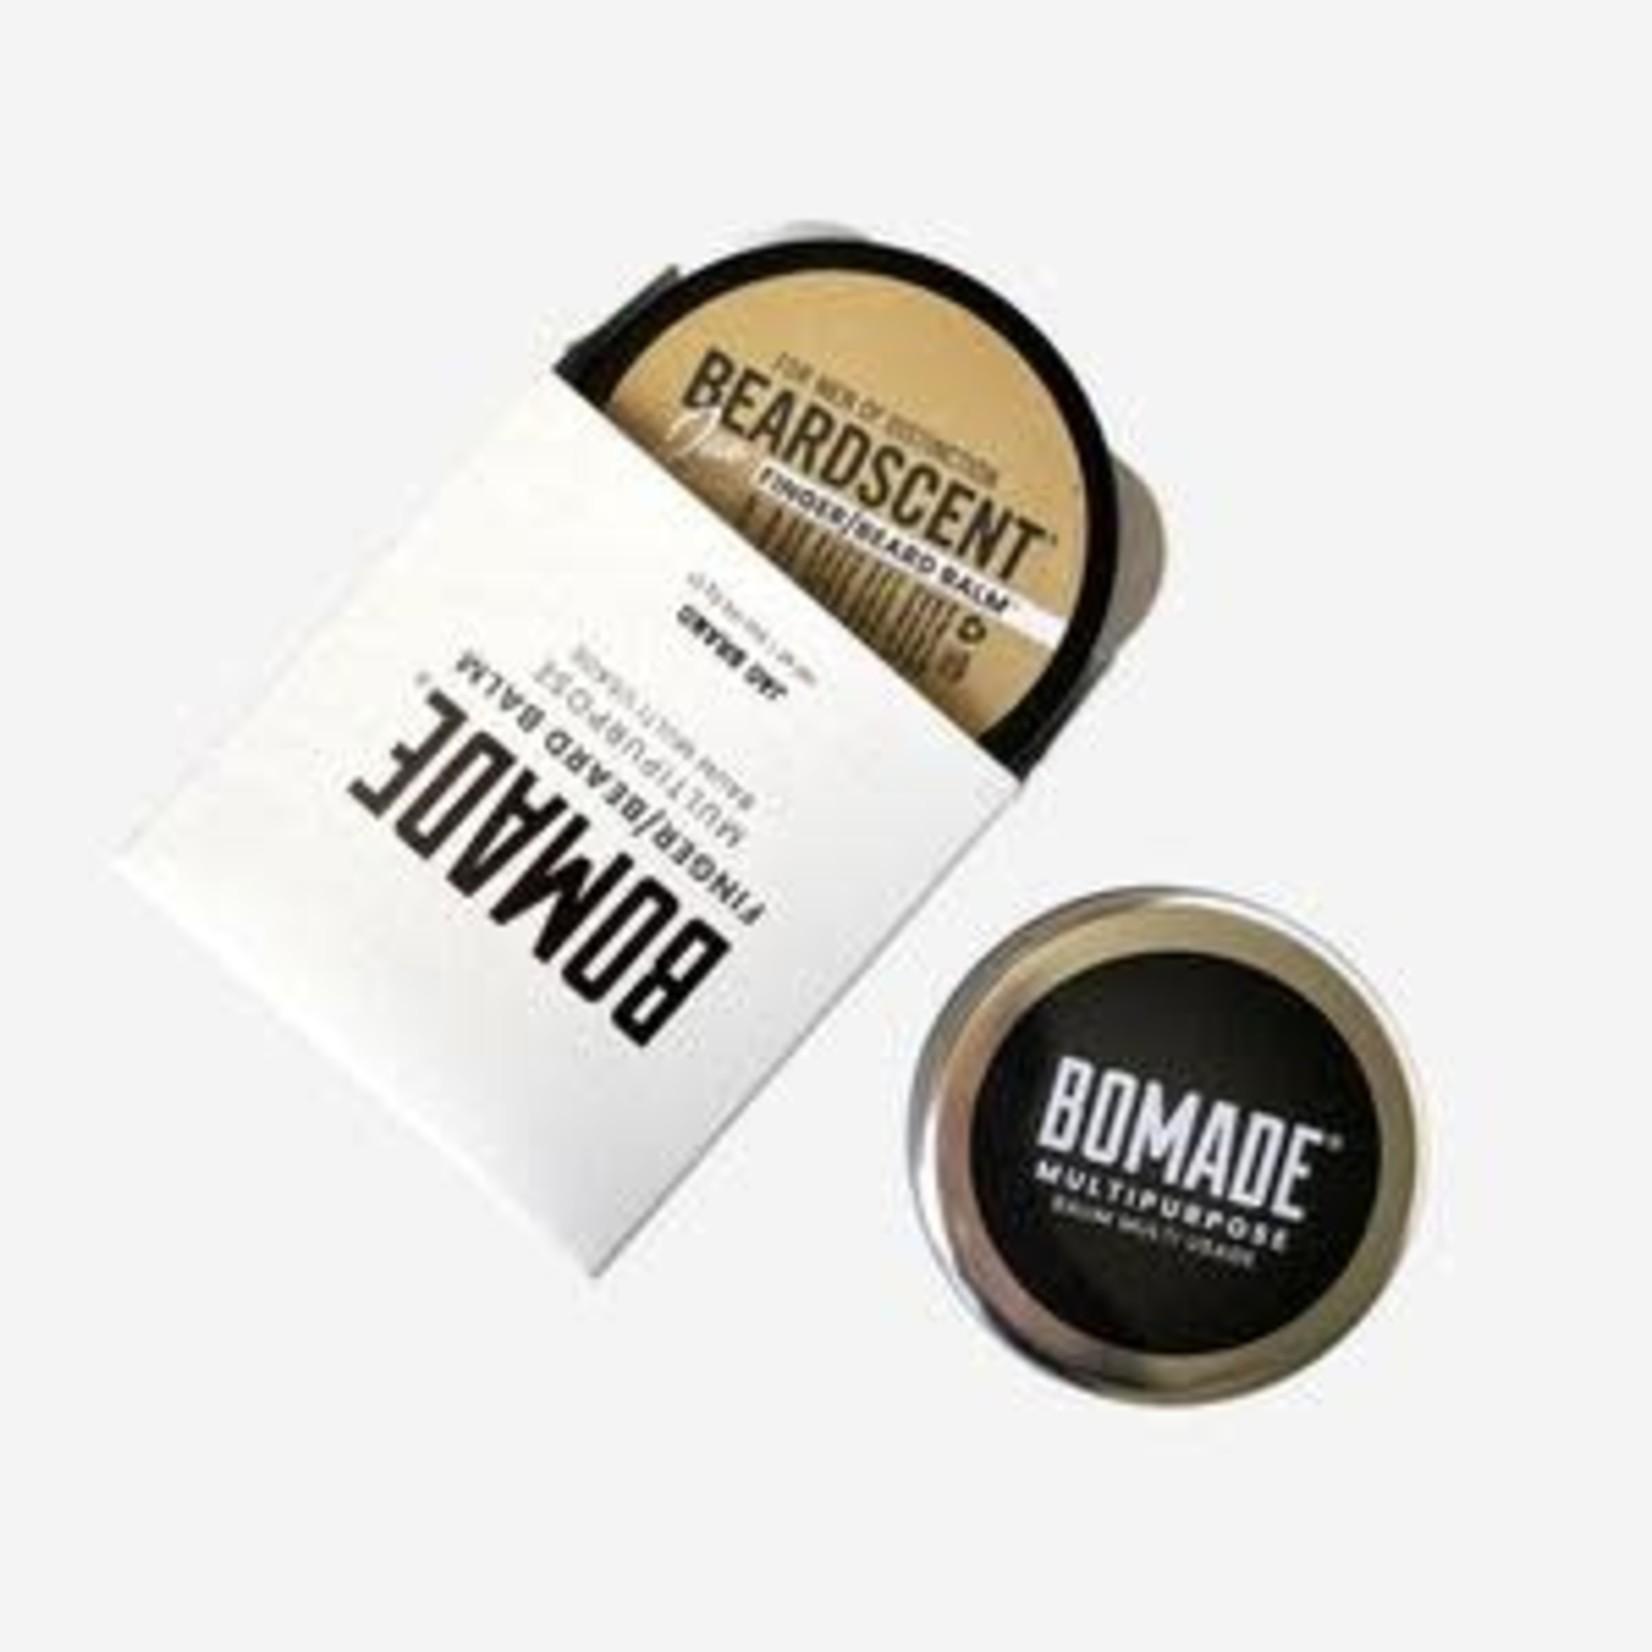 Jao Jao Bomade: BeardScent (1.6 oz)